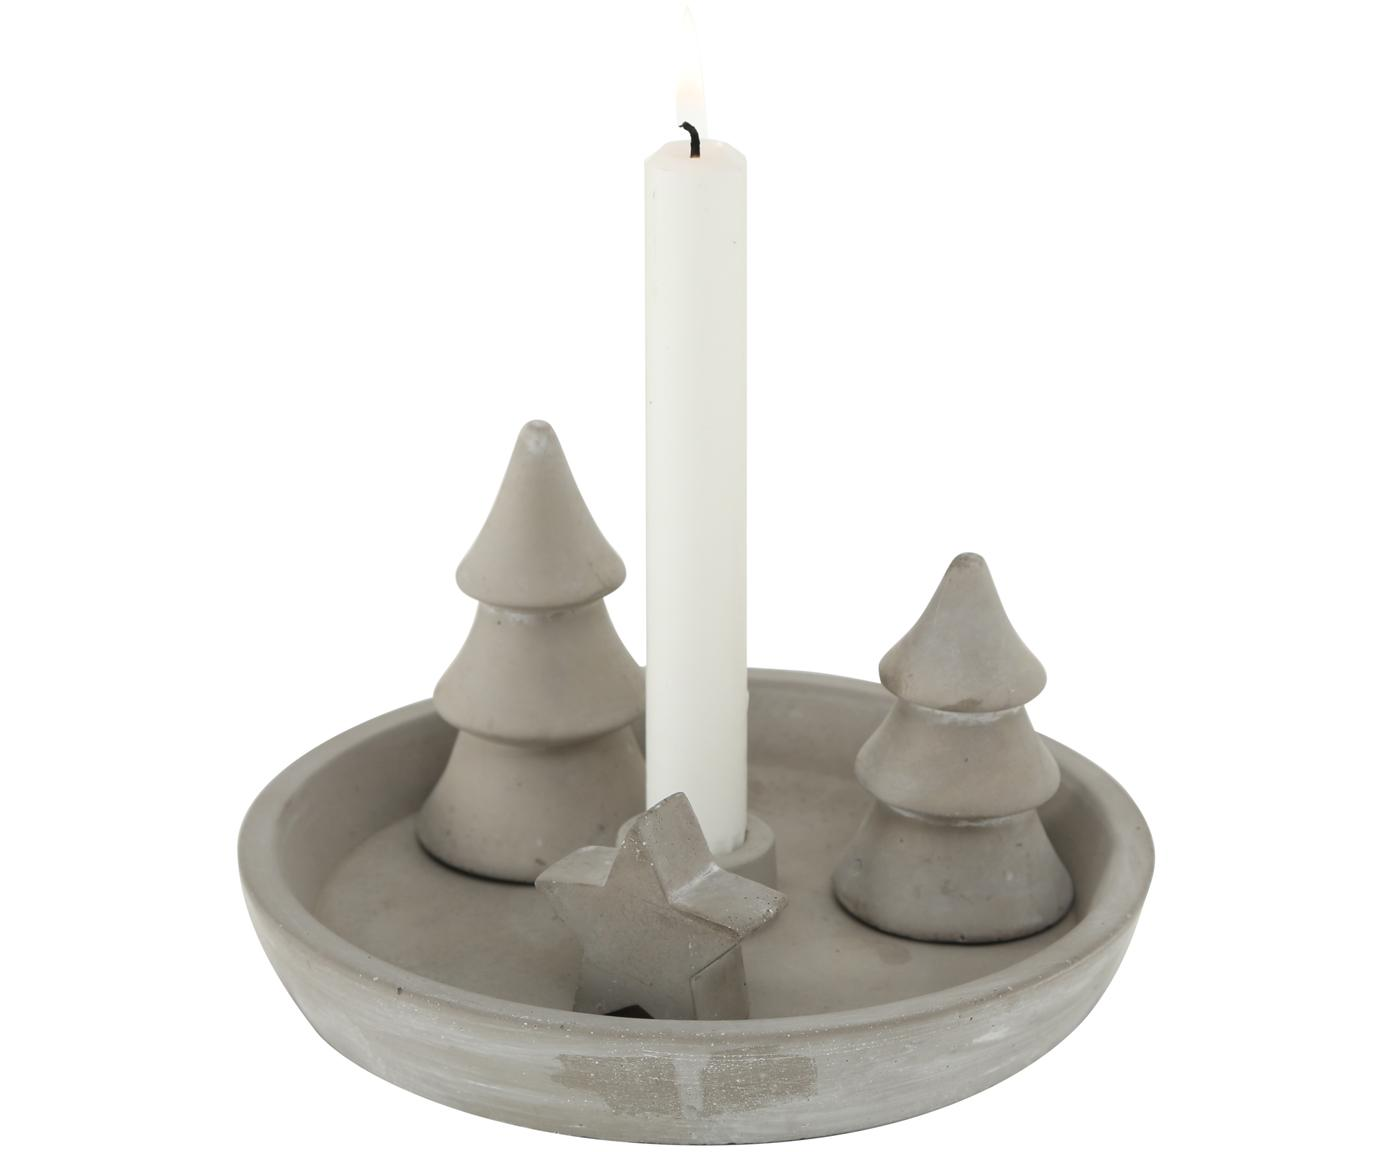 Set portacandela natalizio in cemento Bolek 4 pz, Cemento, Grigio, Ø 20 x Alt. 11 cm